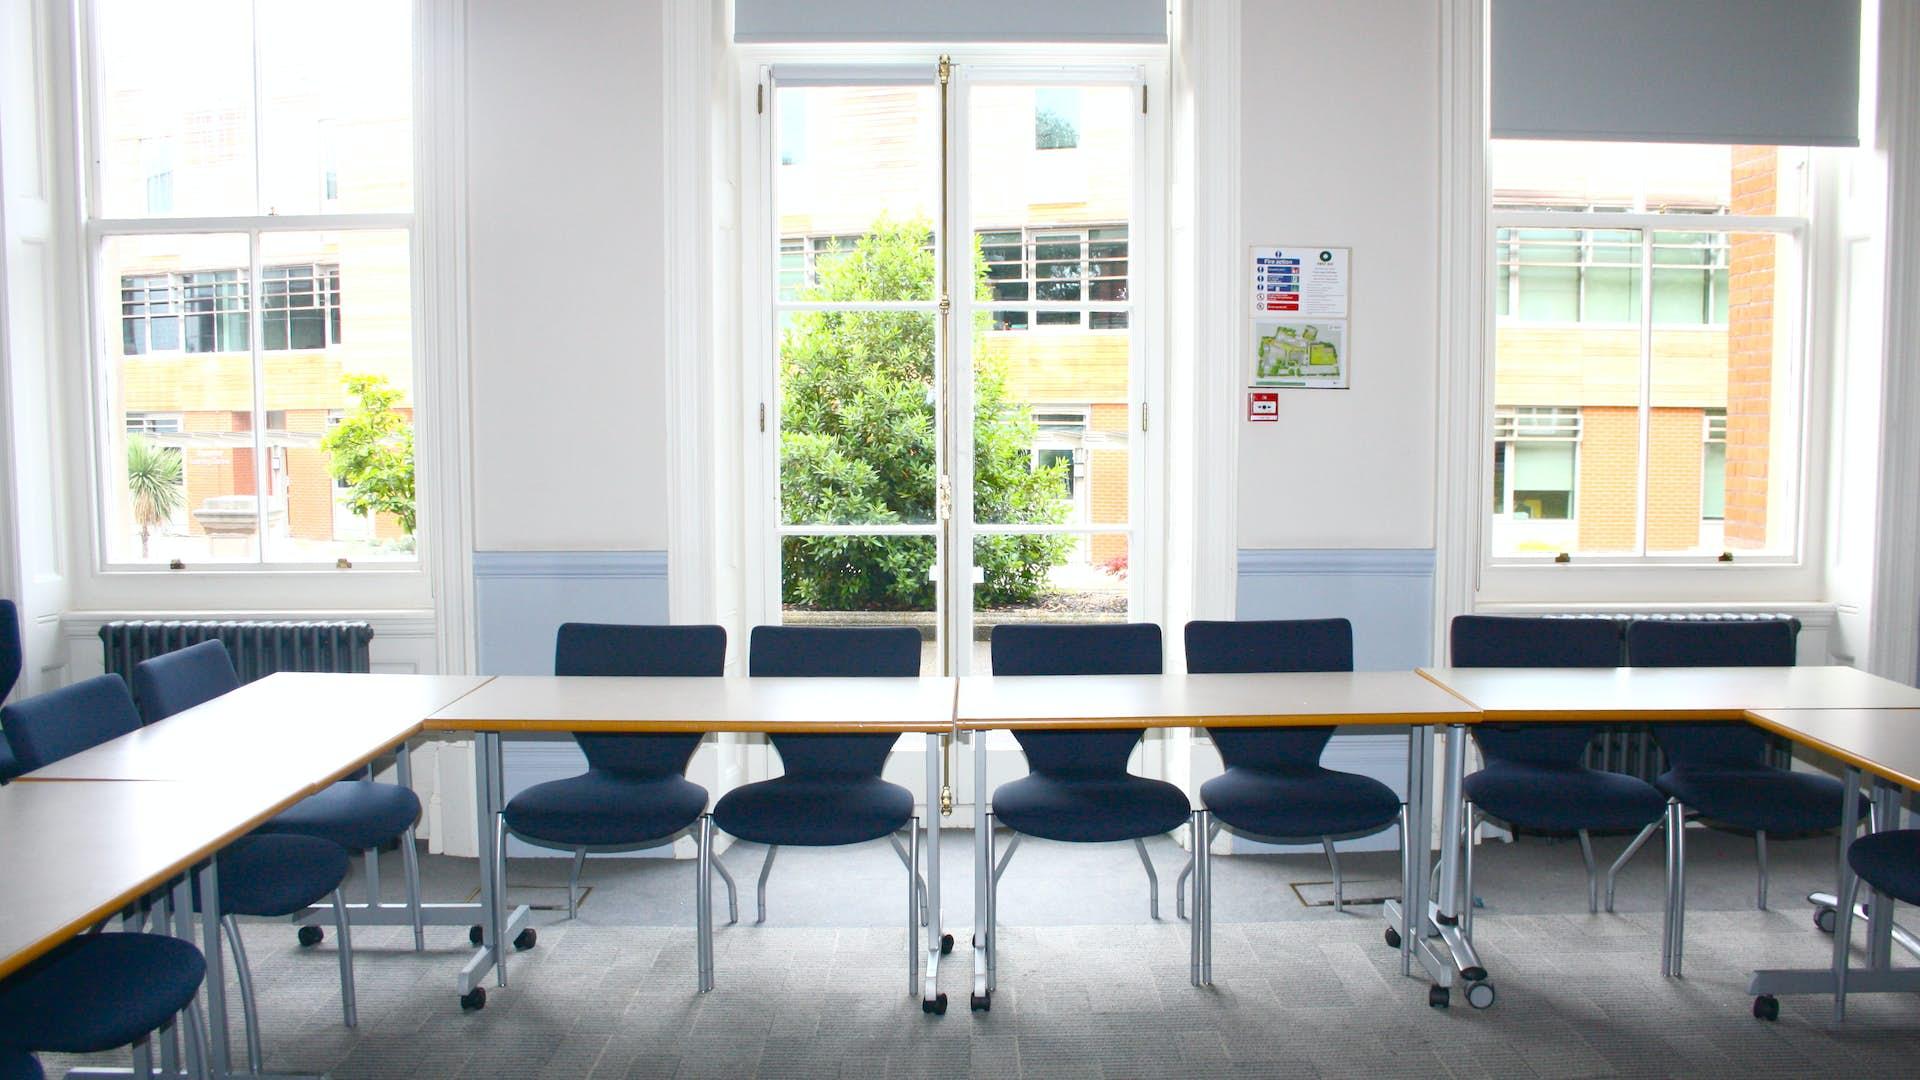 Isleworth Meeting Room Hire